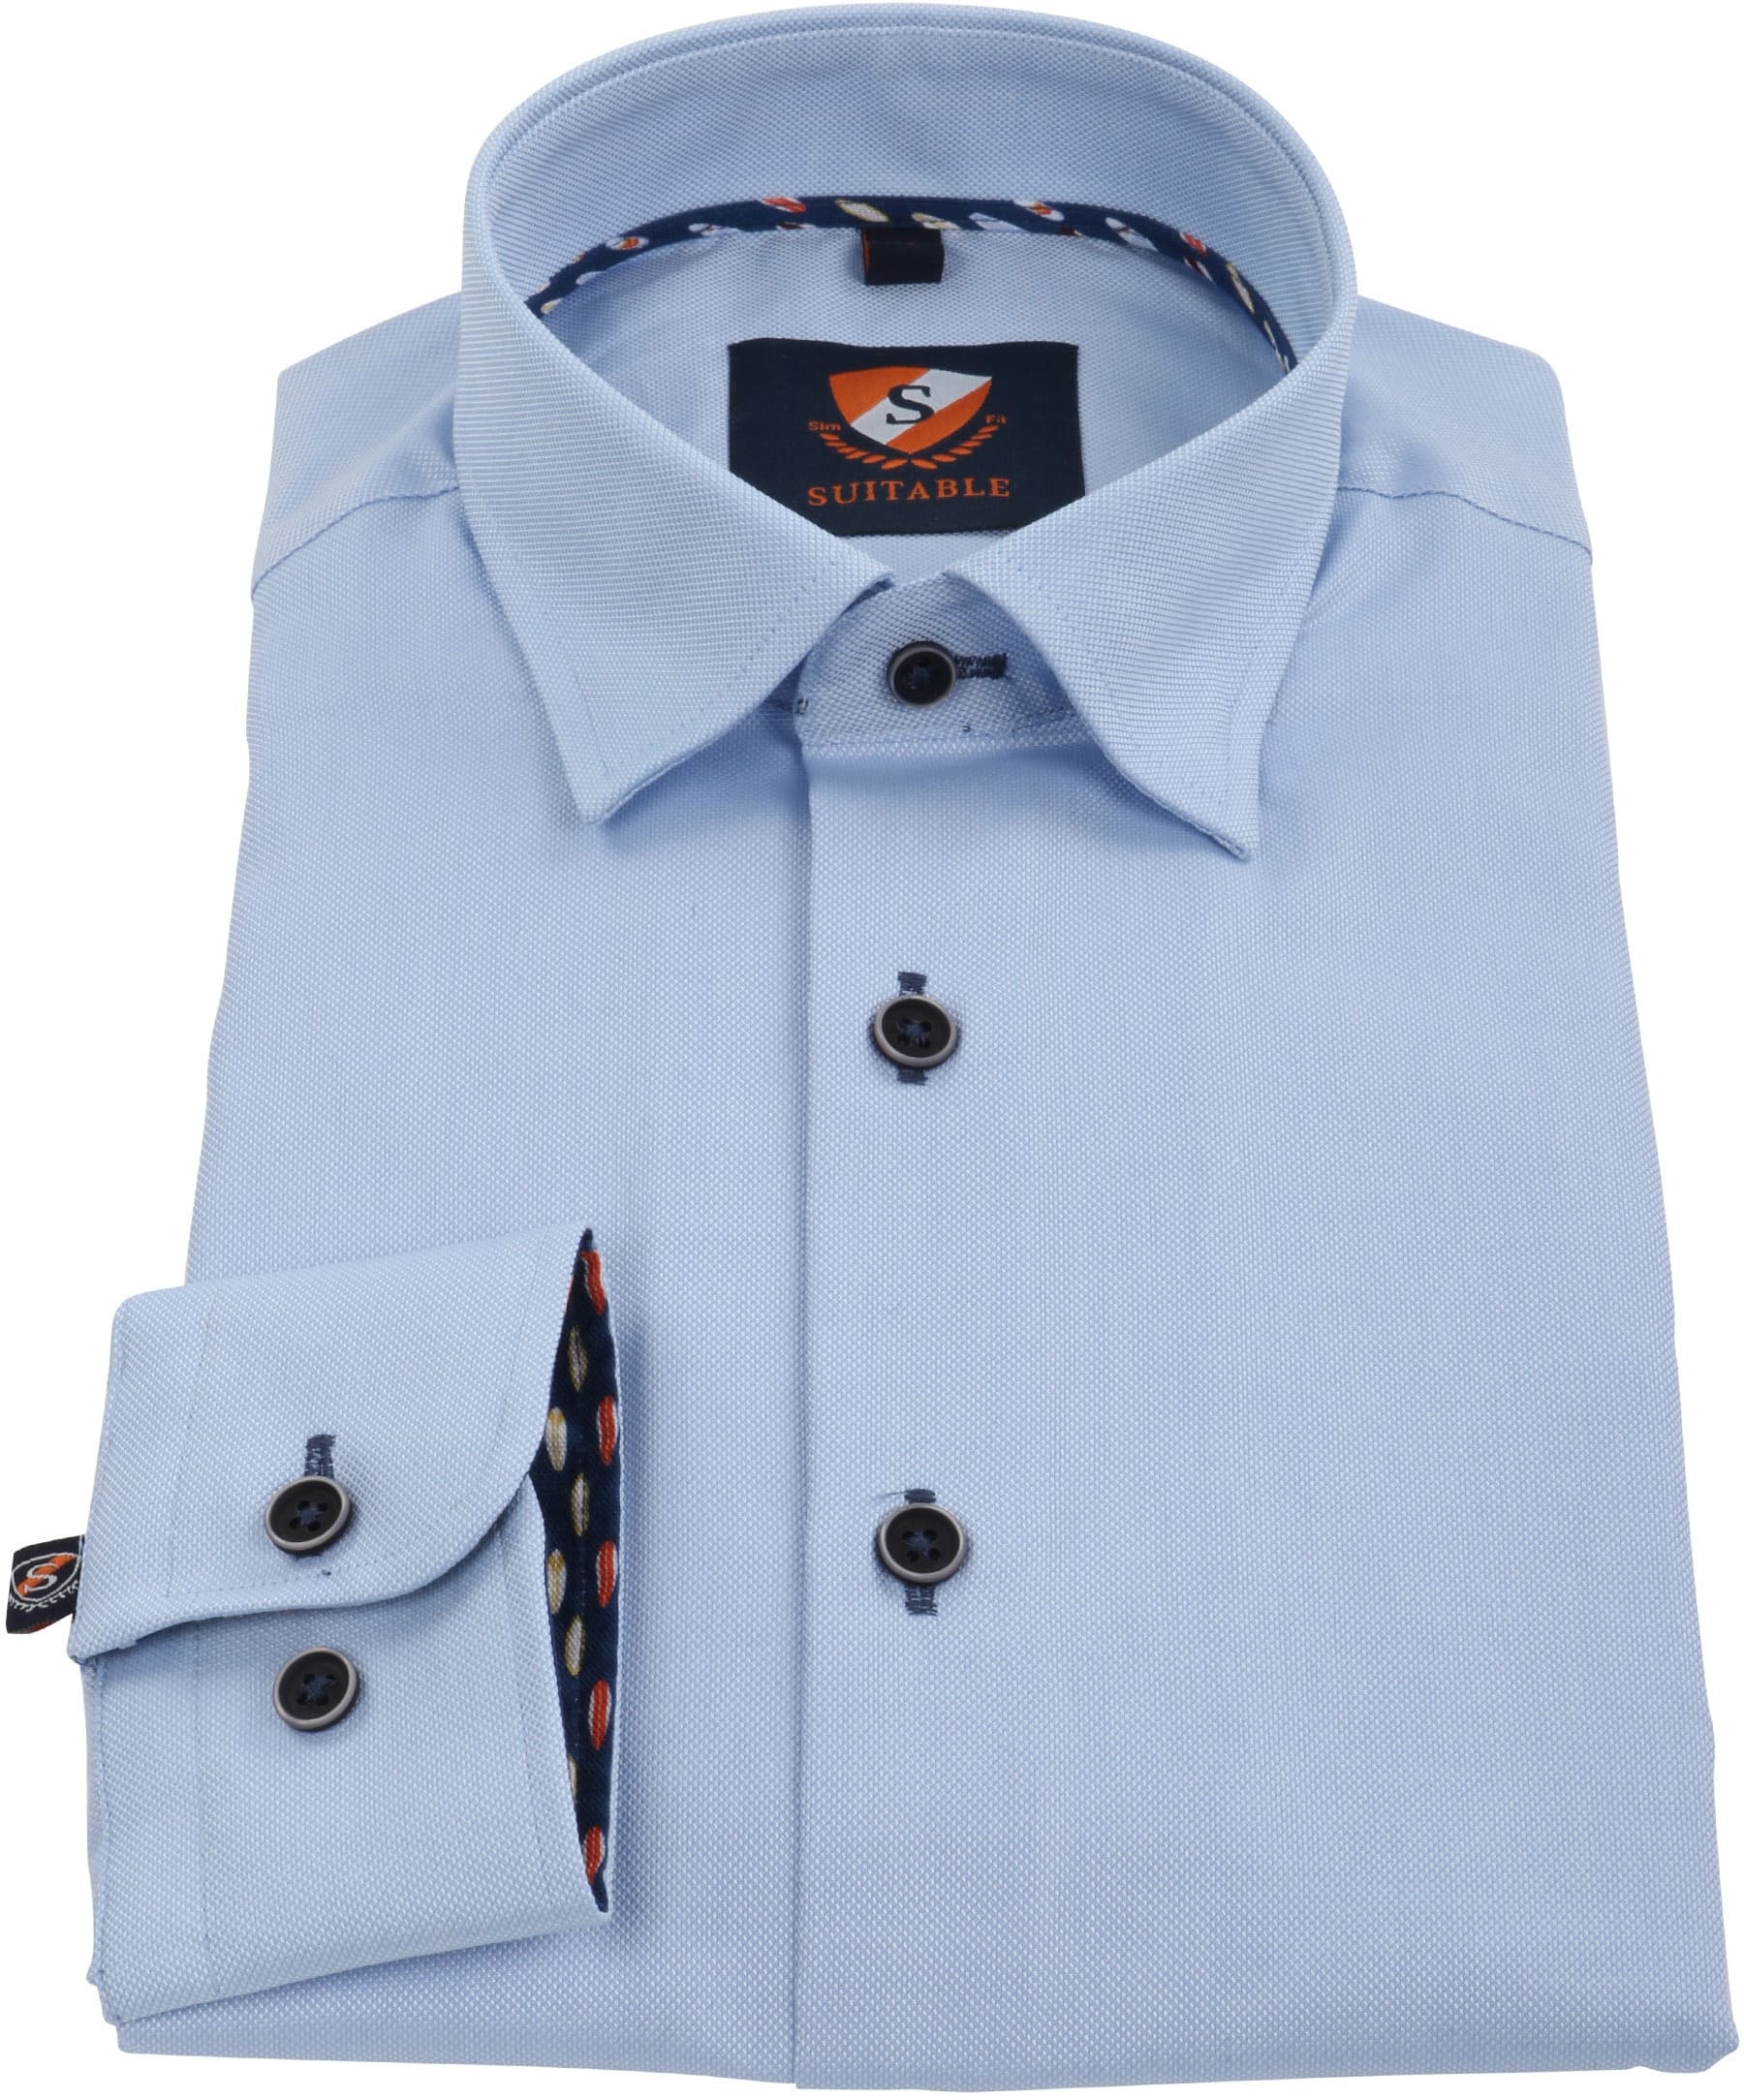 Suitable Shirt Oxford Blue SF foto 2